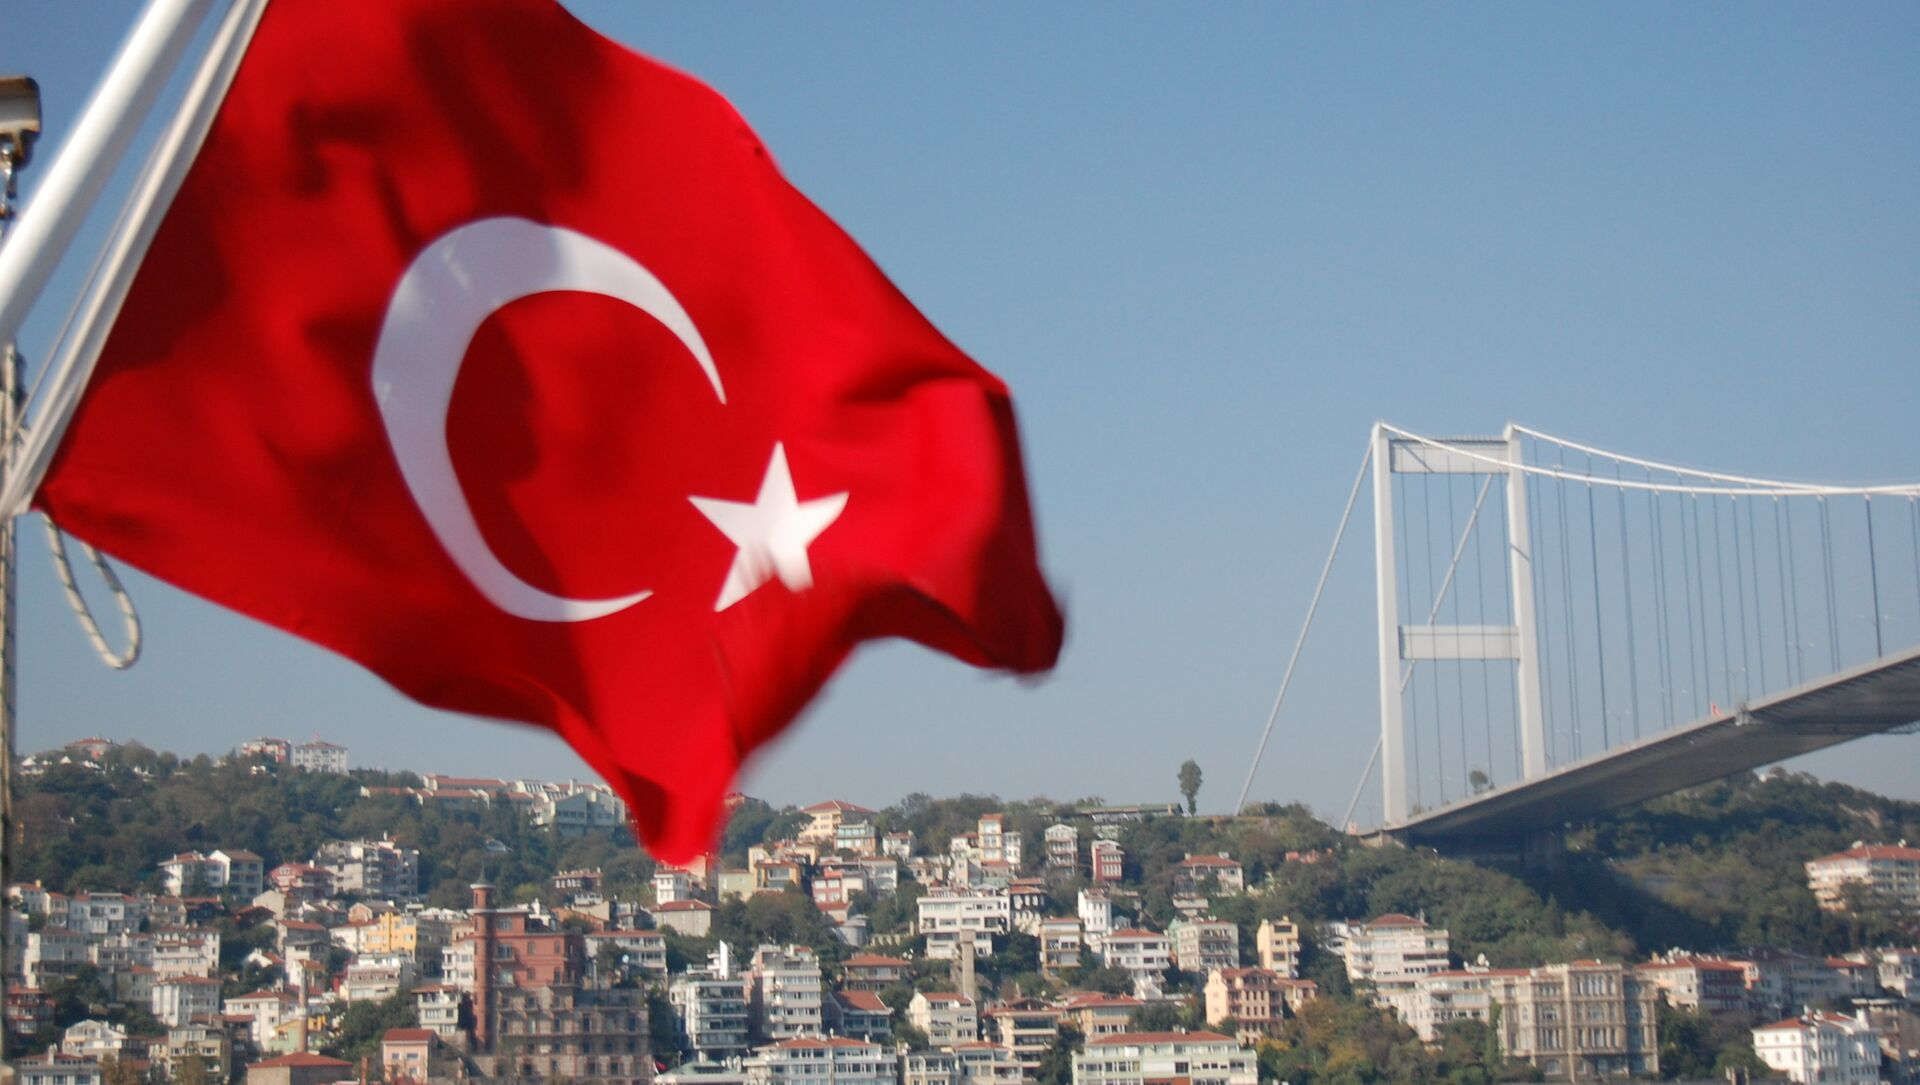 Un drapeau turc - Sputnik France, 1920, 08.08.2021